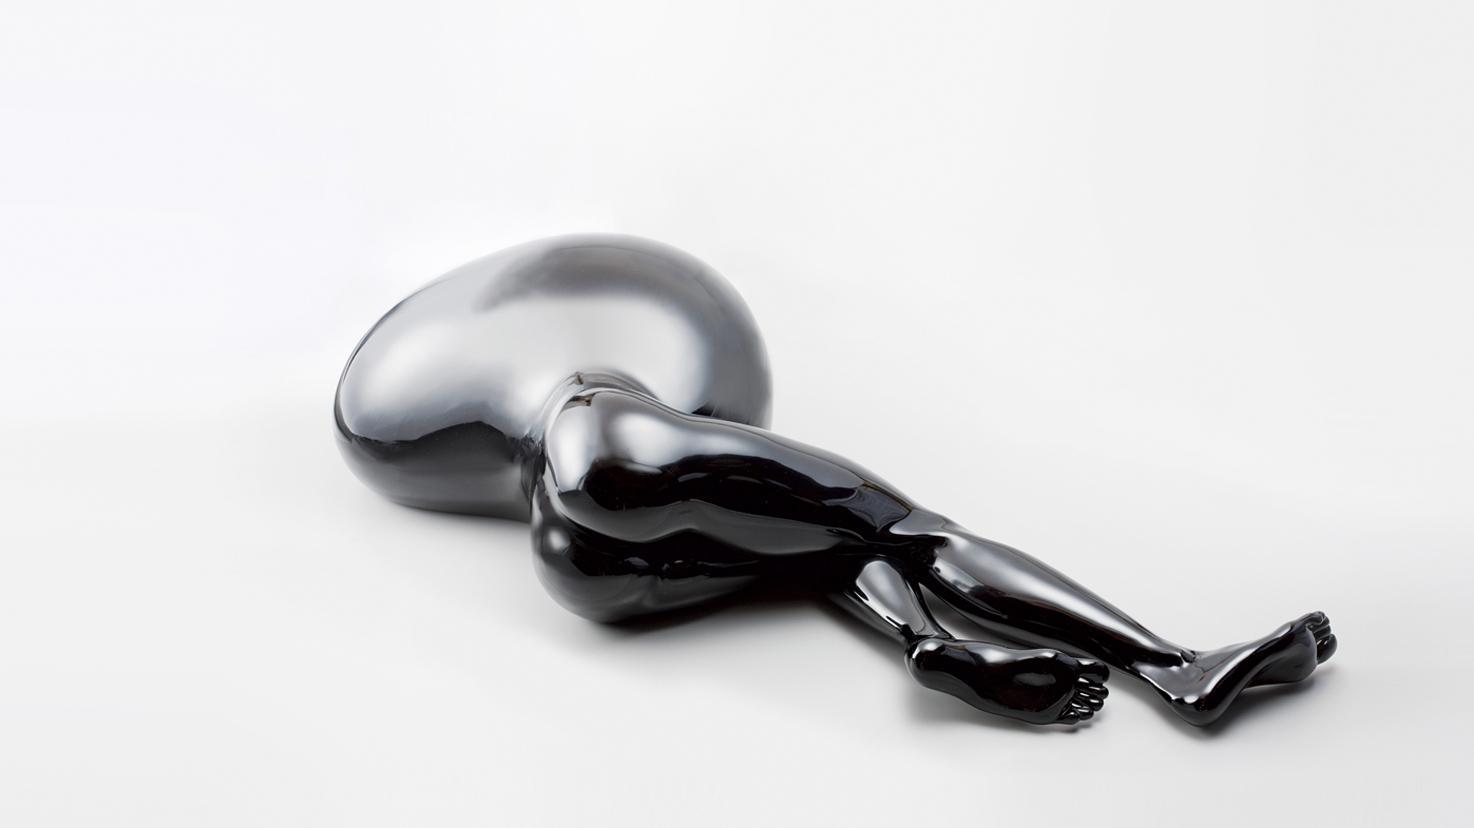 http://www.gallery-sokyo.jp/img/artists/aokichie/body10-1.jpg